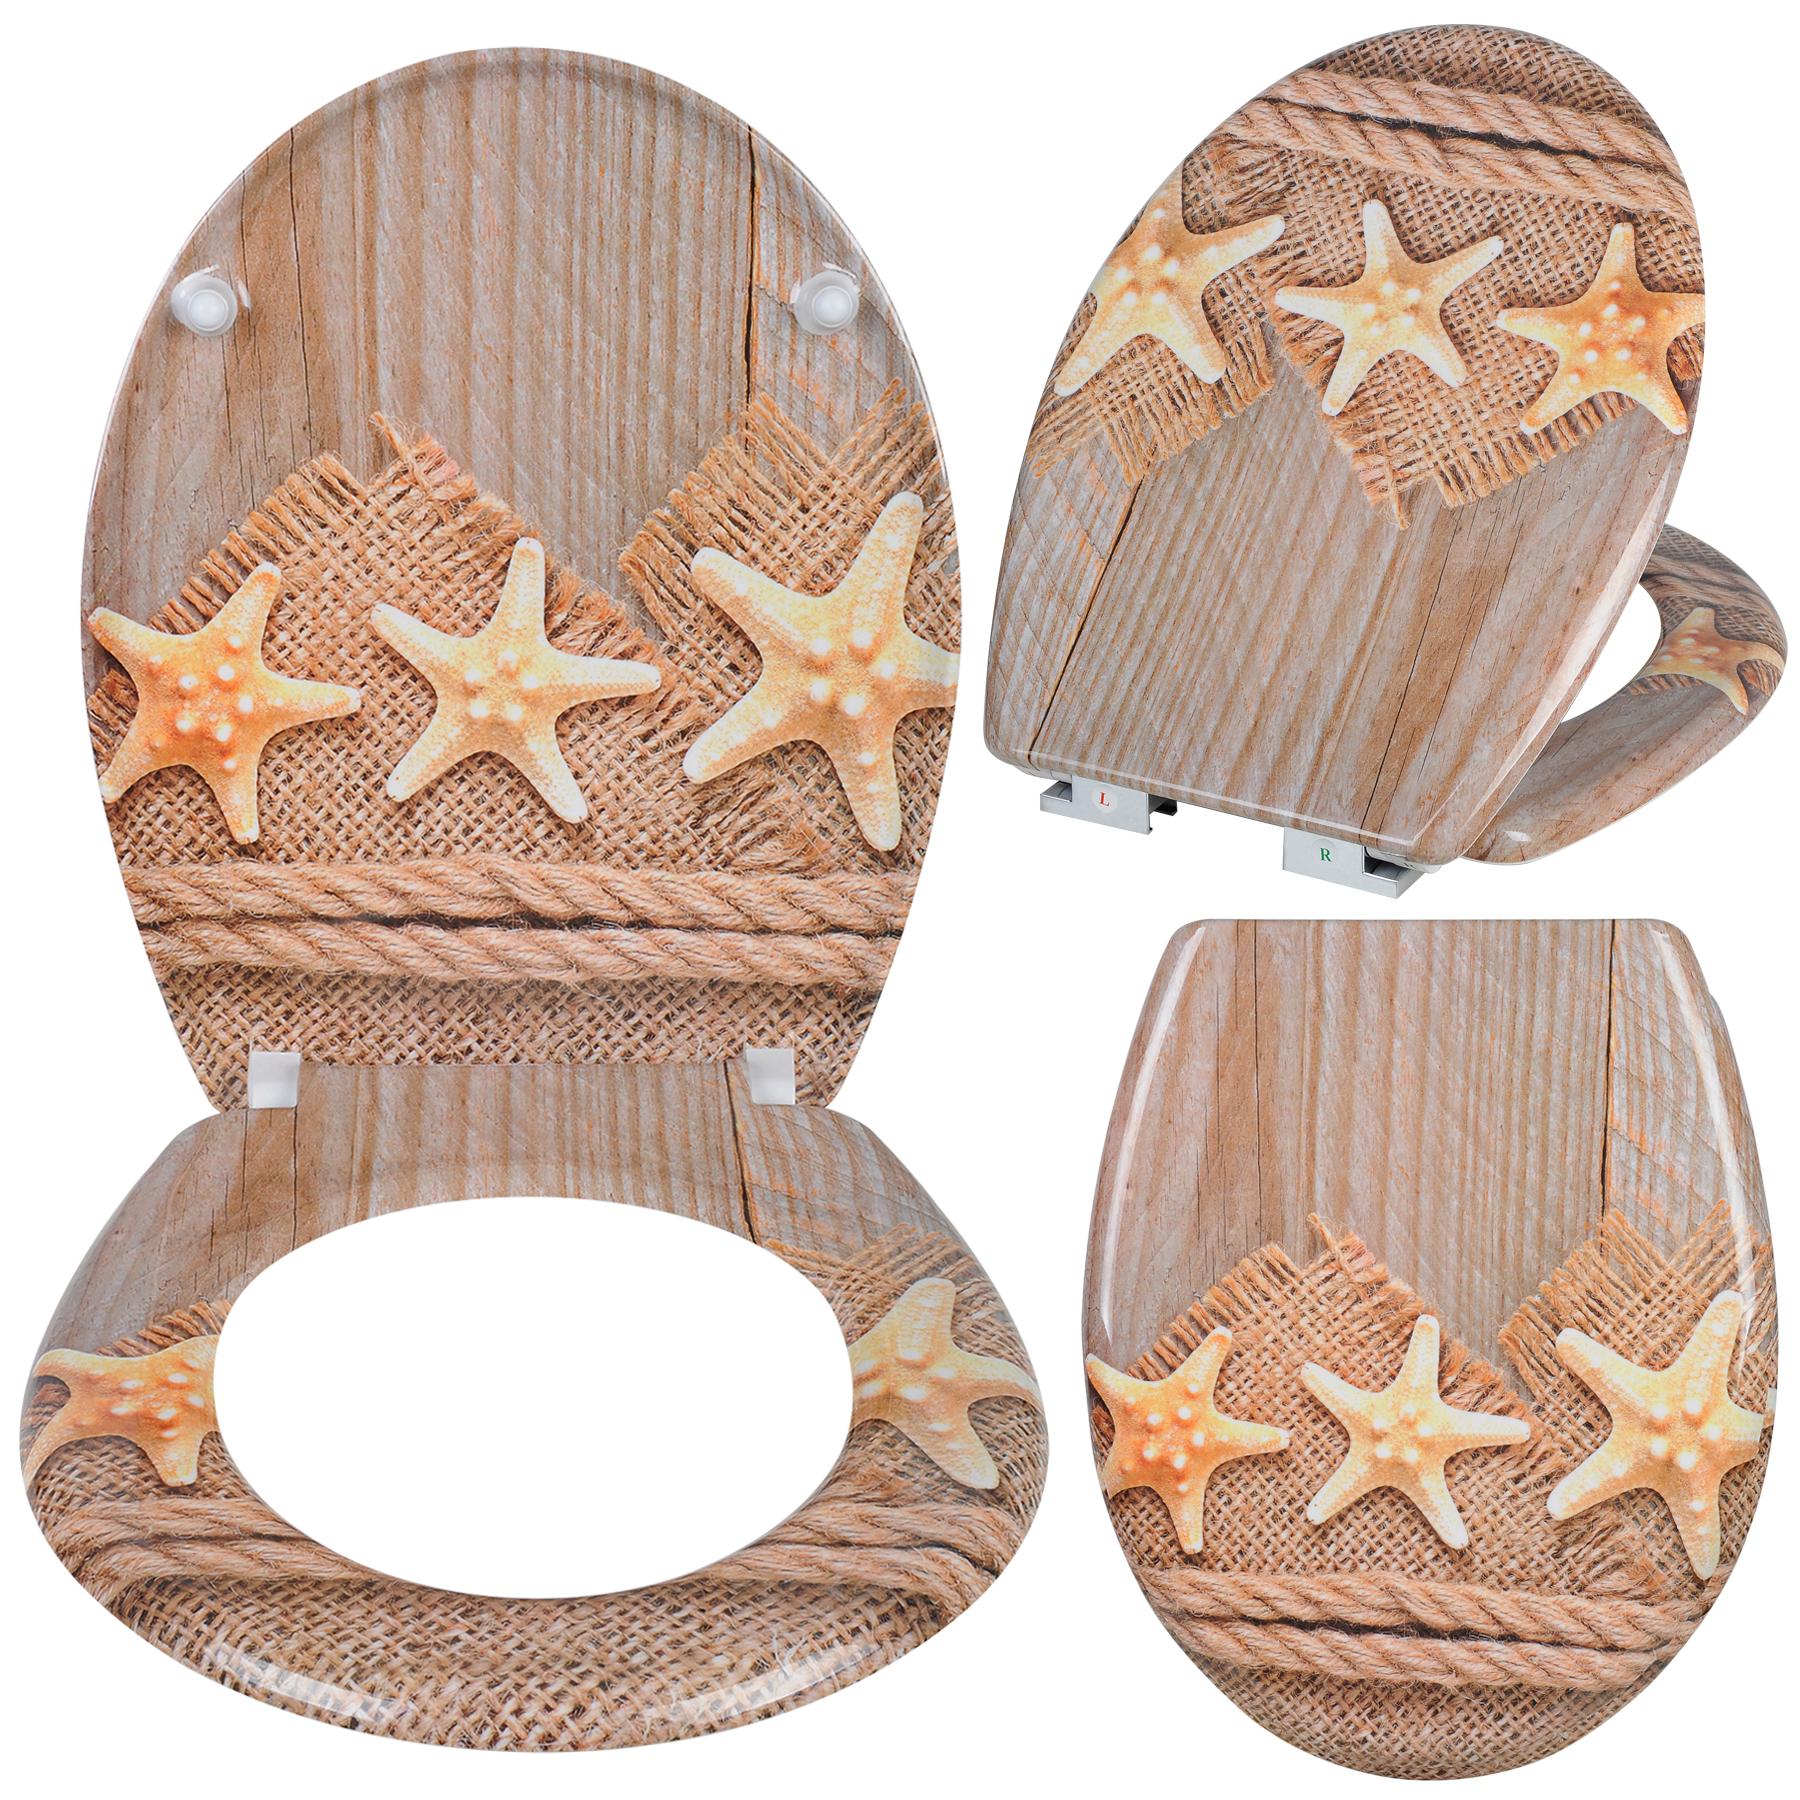 lunette wc couvercle de toilette fermeture amortisseur duroplast si ge 60 ebay. Black Bedroom Furniture Sets. Home Design Ideas